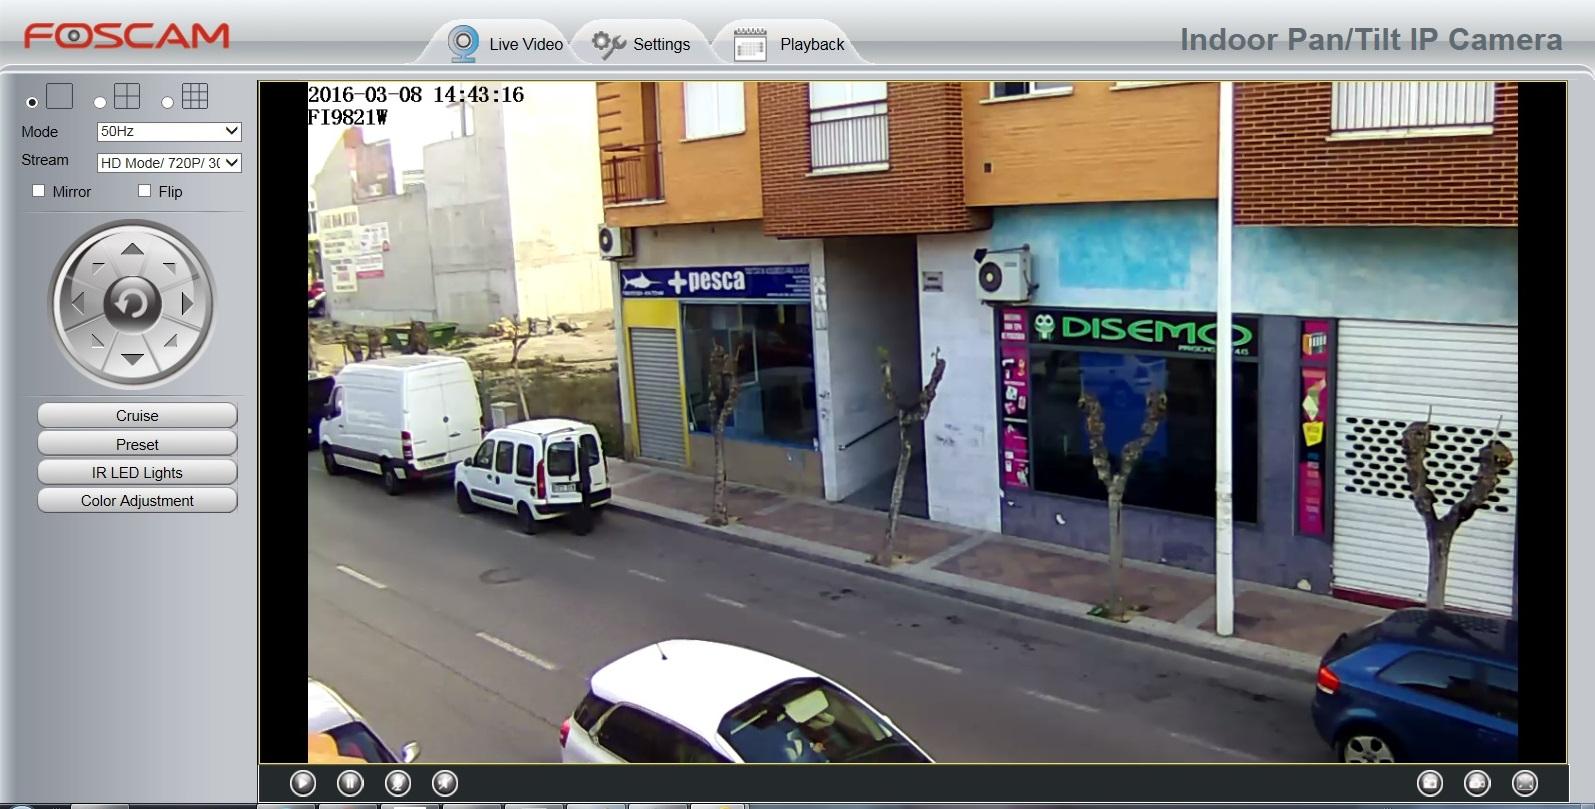 Demostración Foscam FI9821P Angulo 75º Resolución HD 720P